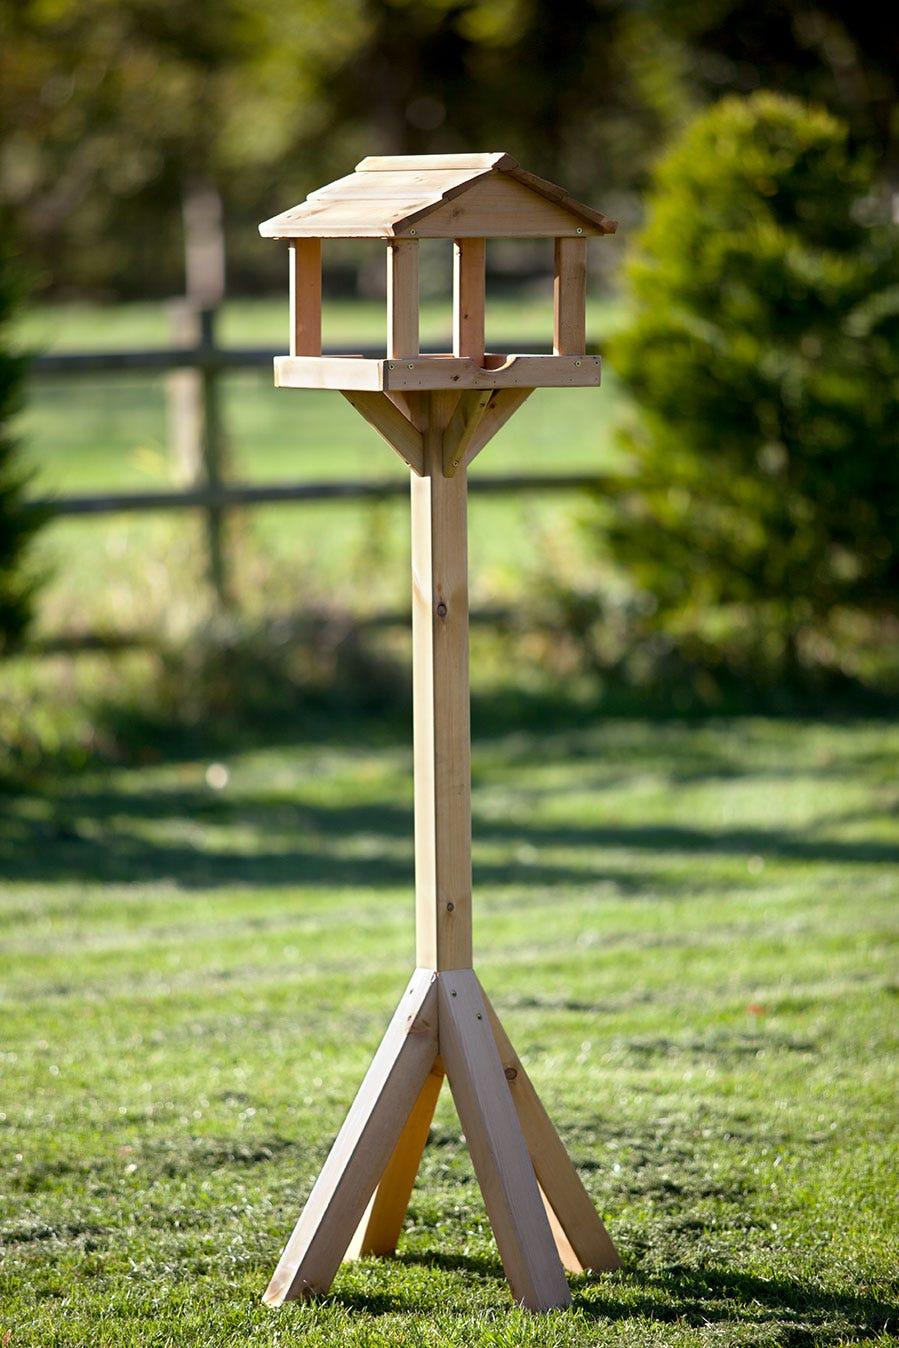 RSPB Freestanding bird table